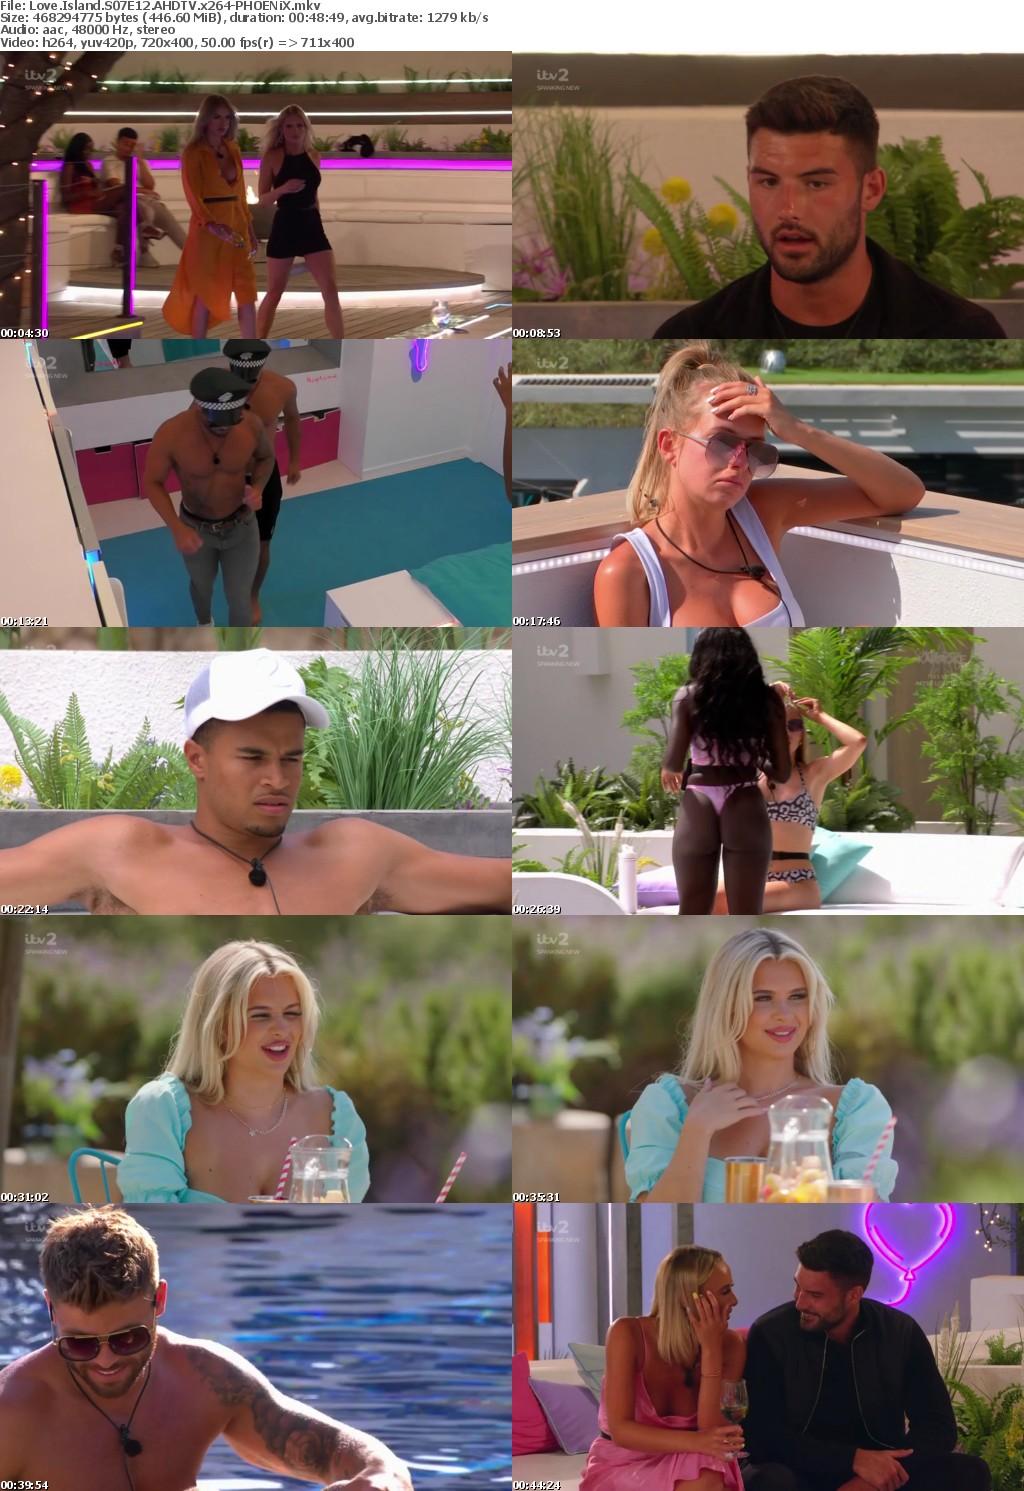 Love Island S07E12 AHDTV x264-PHOENiX